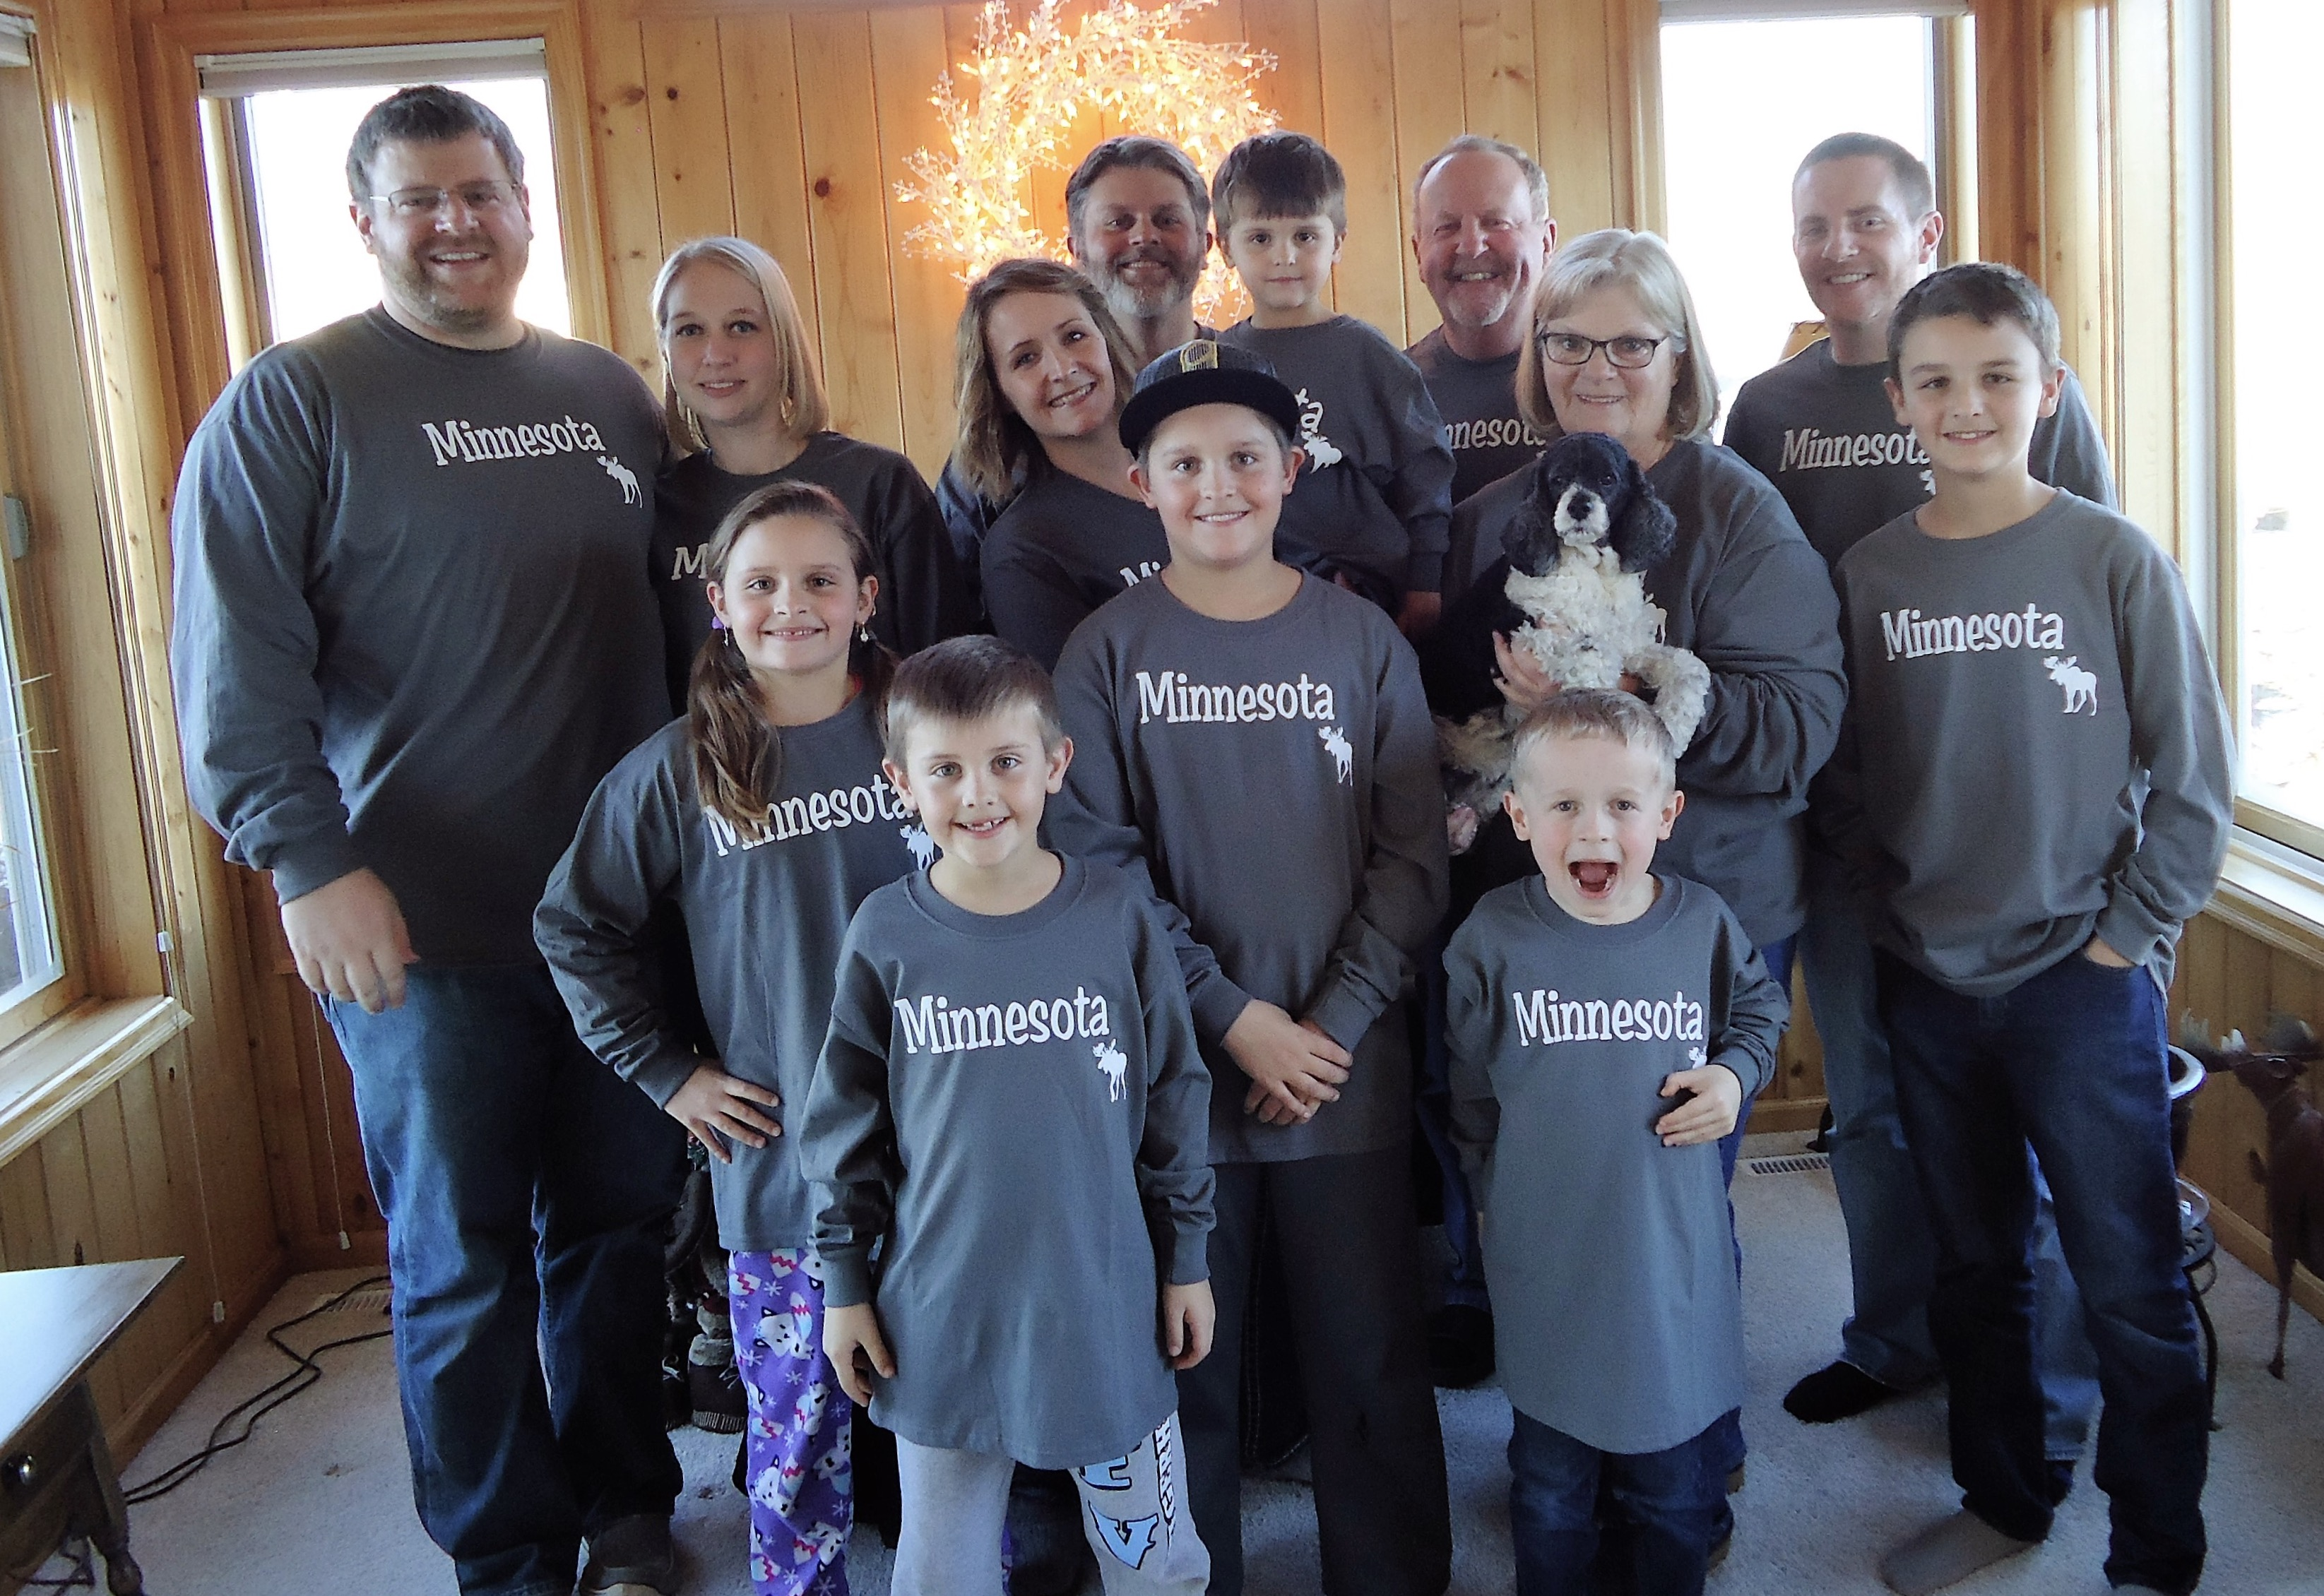 Custom T Shirts For Family Christmas 2017 Shirt Design Ideas